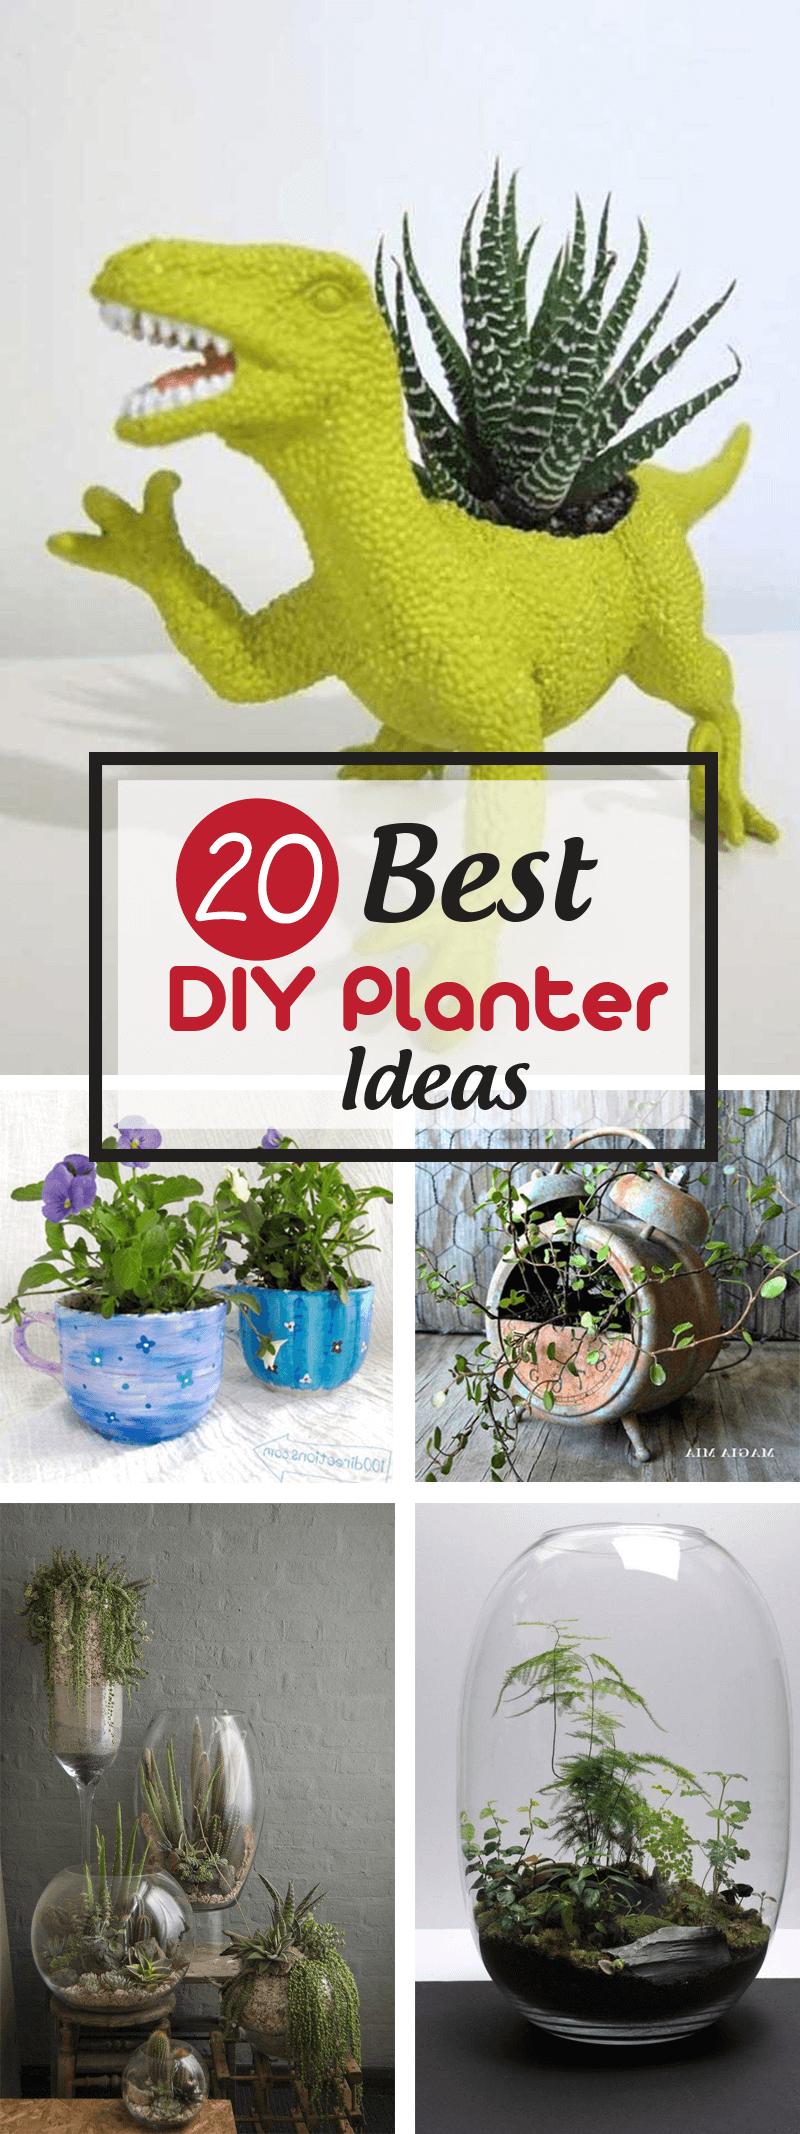 Best DIY Planter Ideas